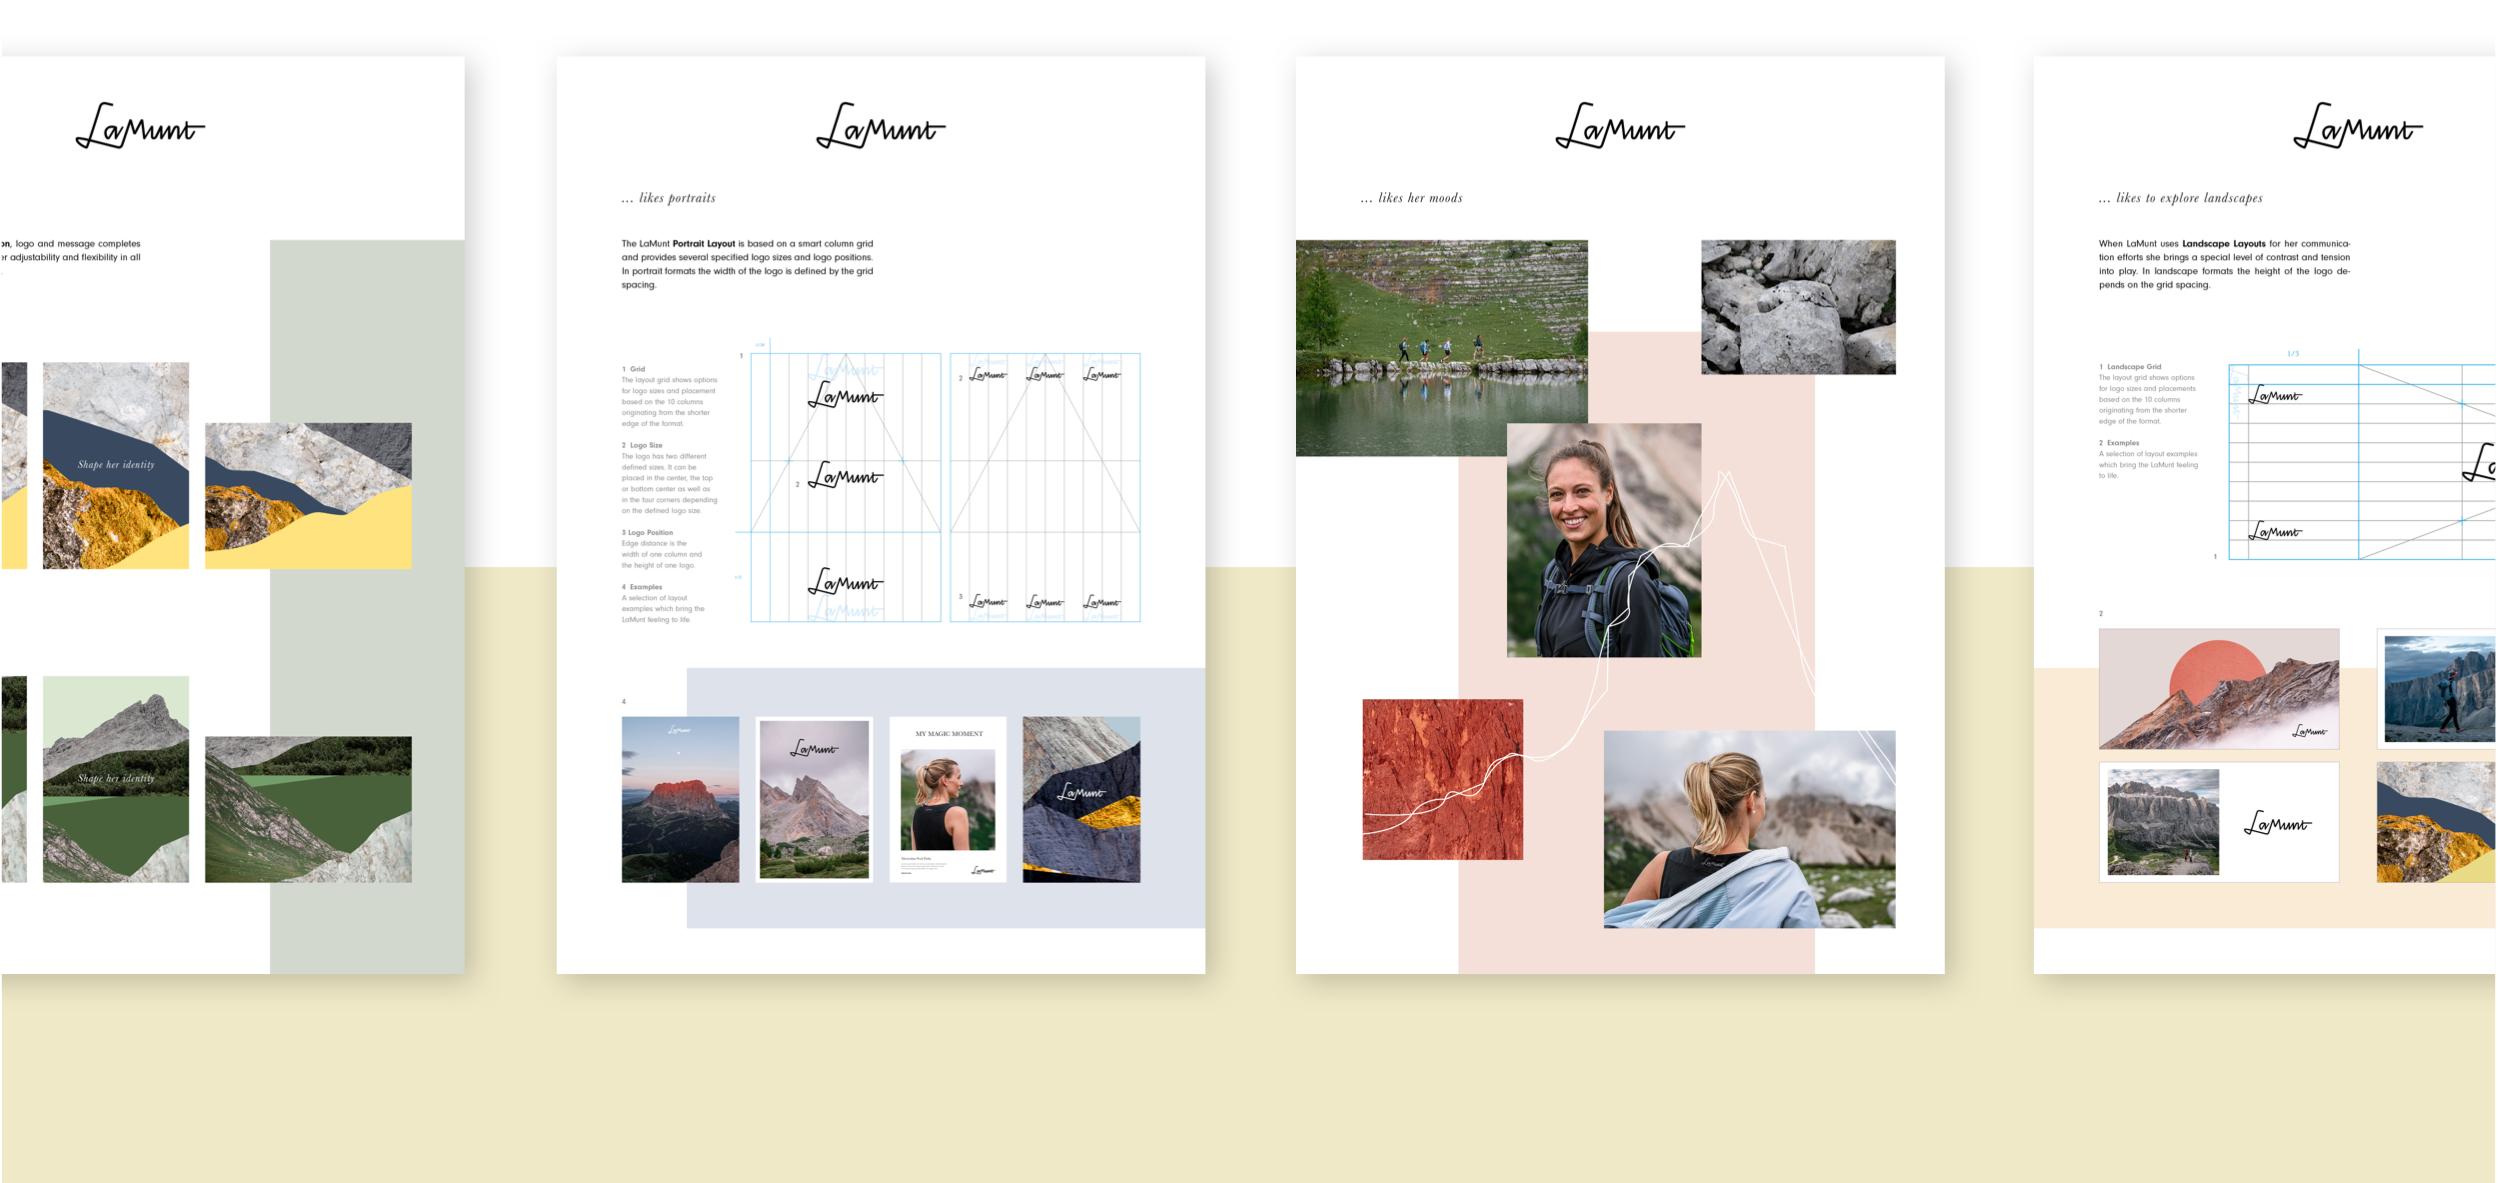 pascher-heinz-lamunt-launch-brand-guide